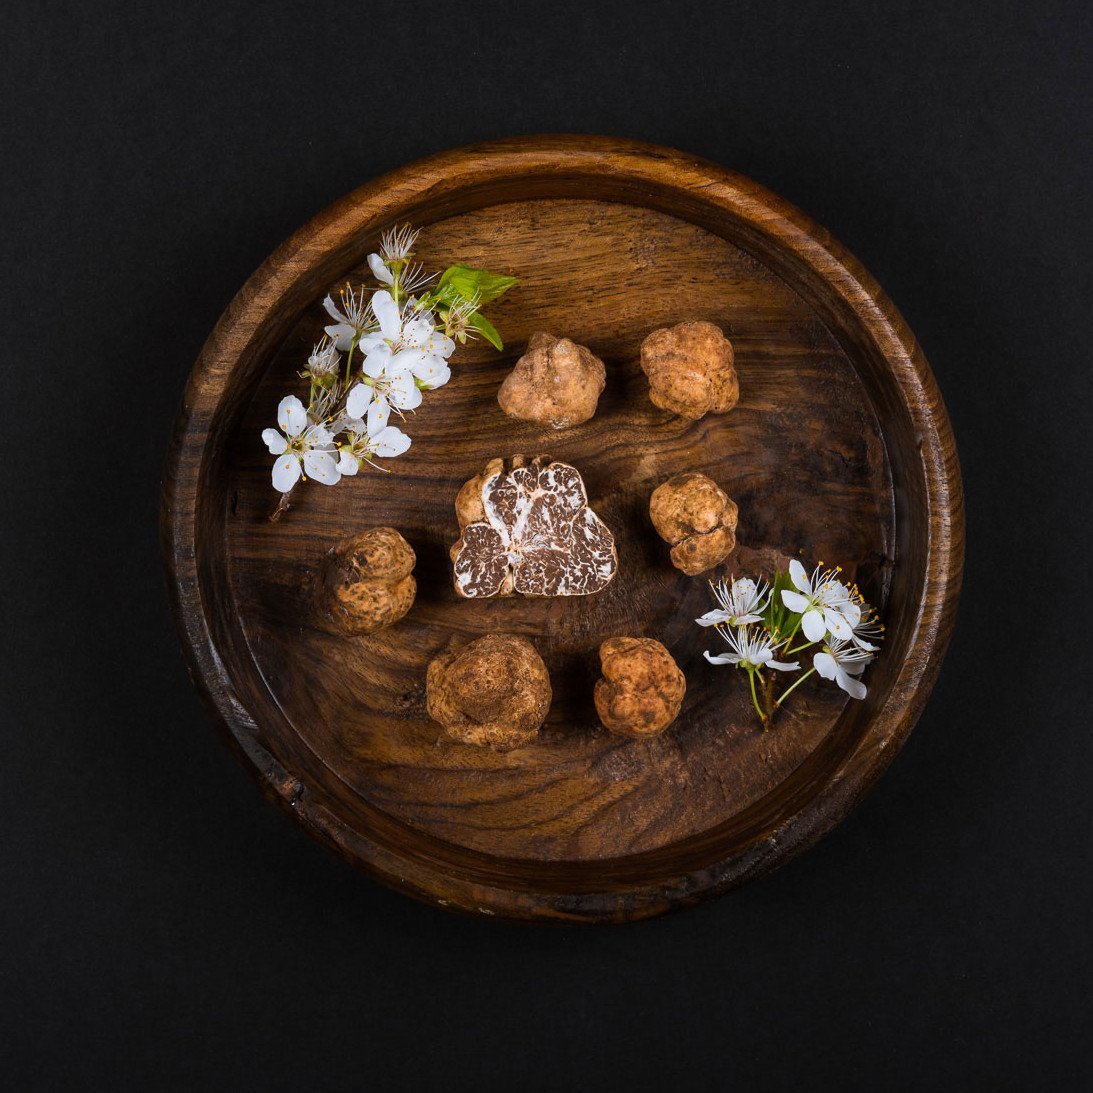 White Spring Truffle - Tuber Borchii